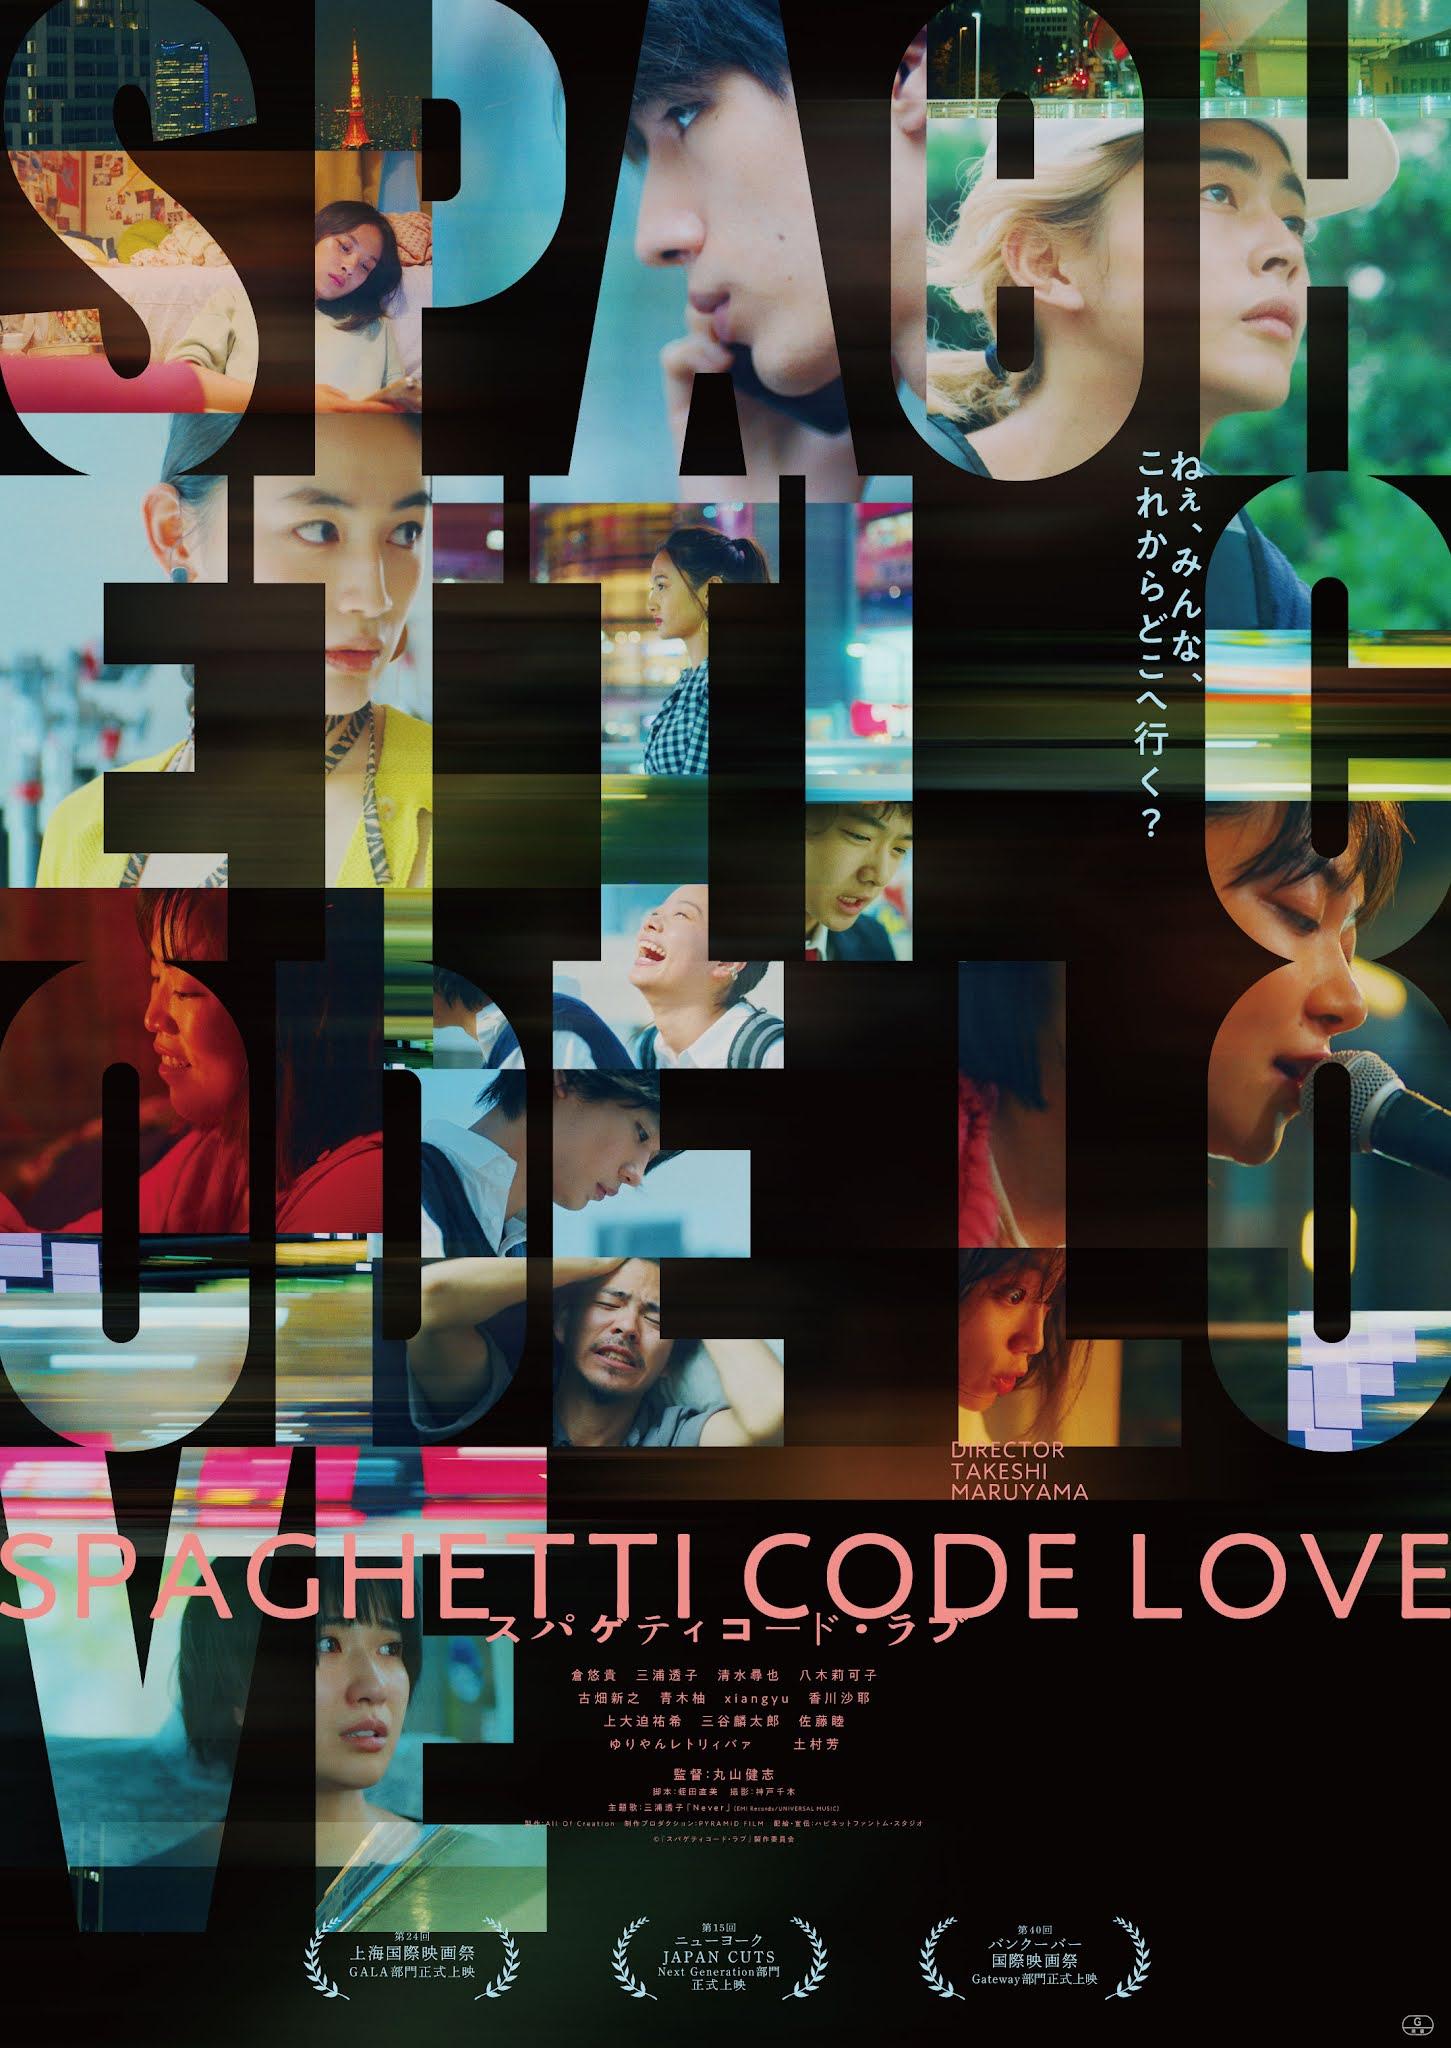 Spaghetti Code LOve film - Takeshi Maruyama - poster